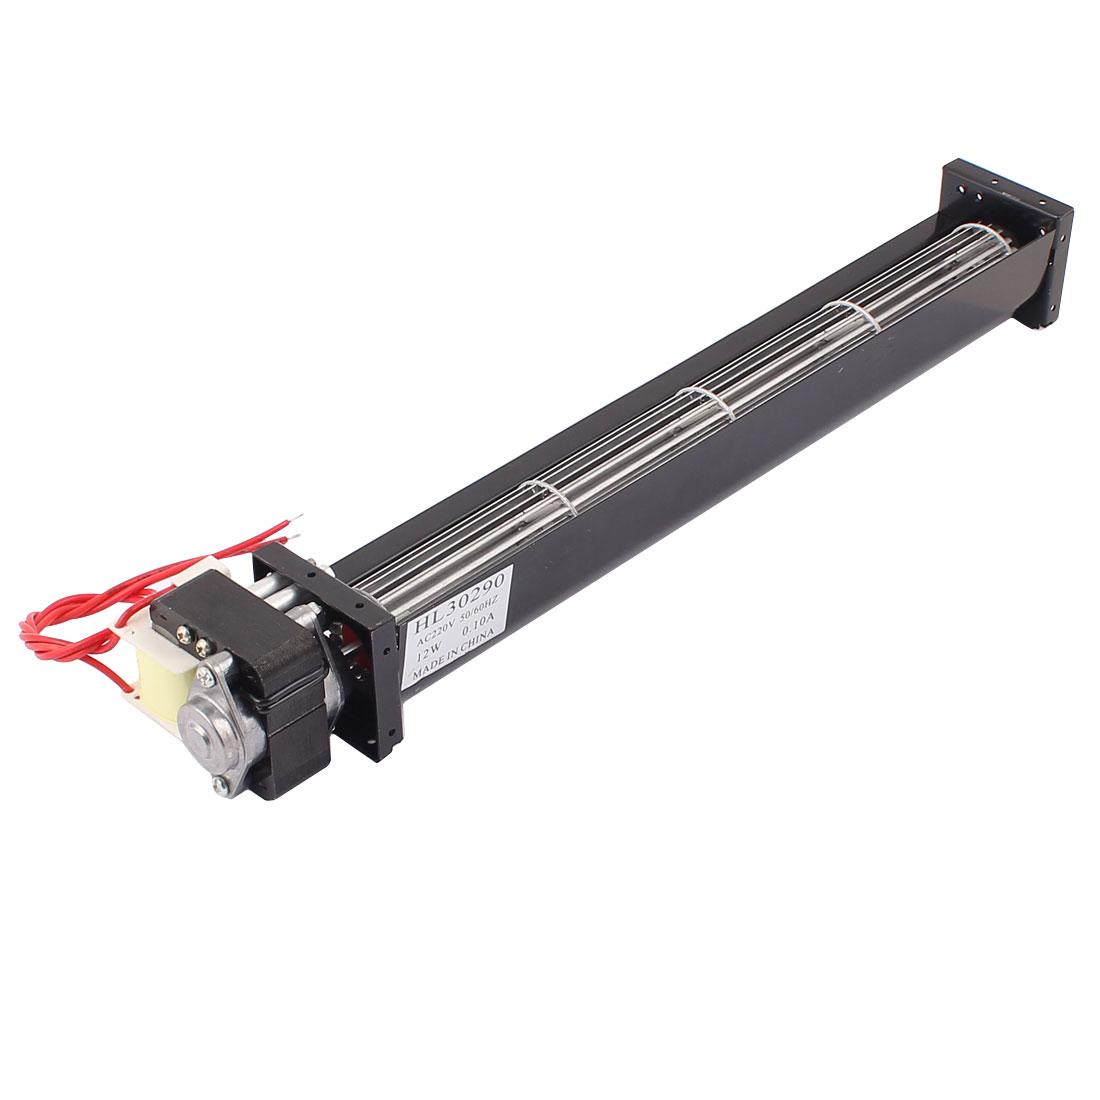 AC 220V 1.4 m3/min Cross Flow Cooling Fan Heat Exchanger Amplifier Cooler